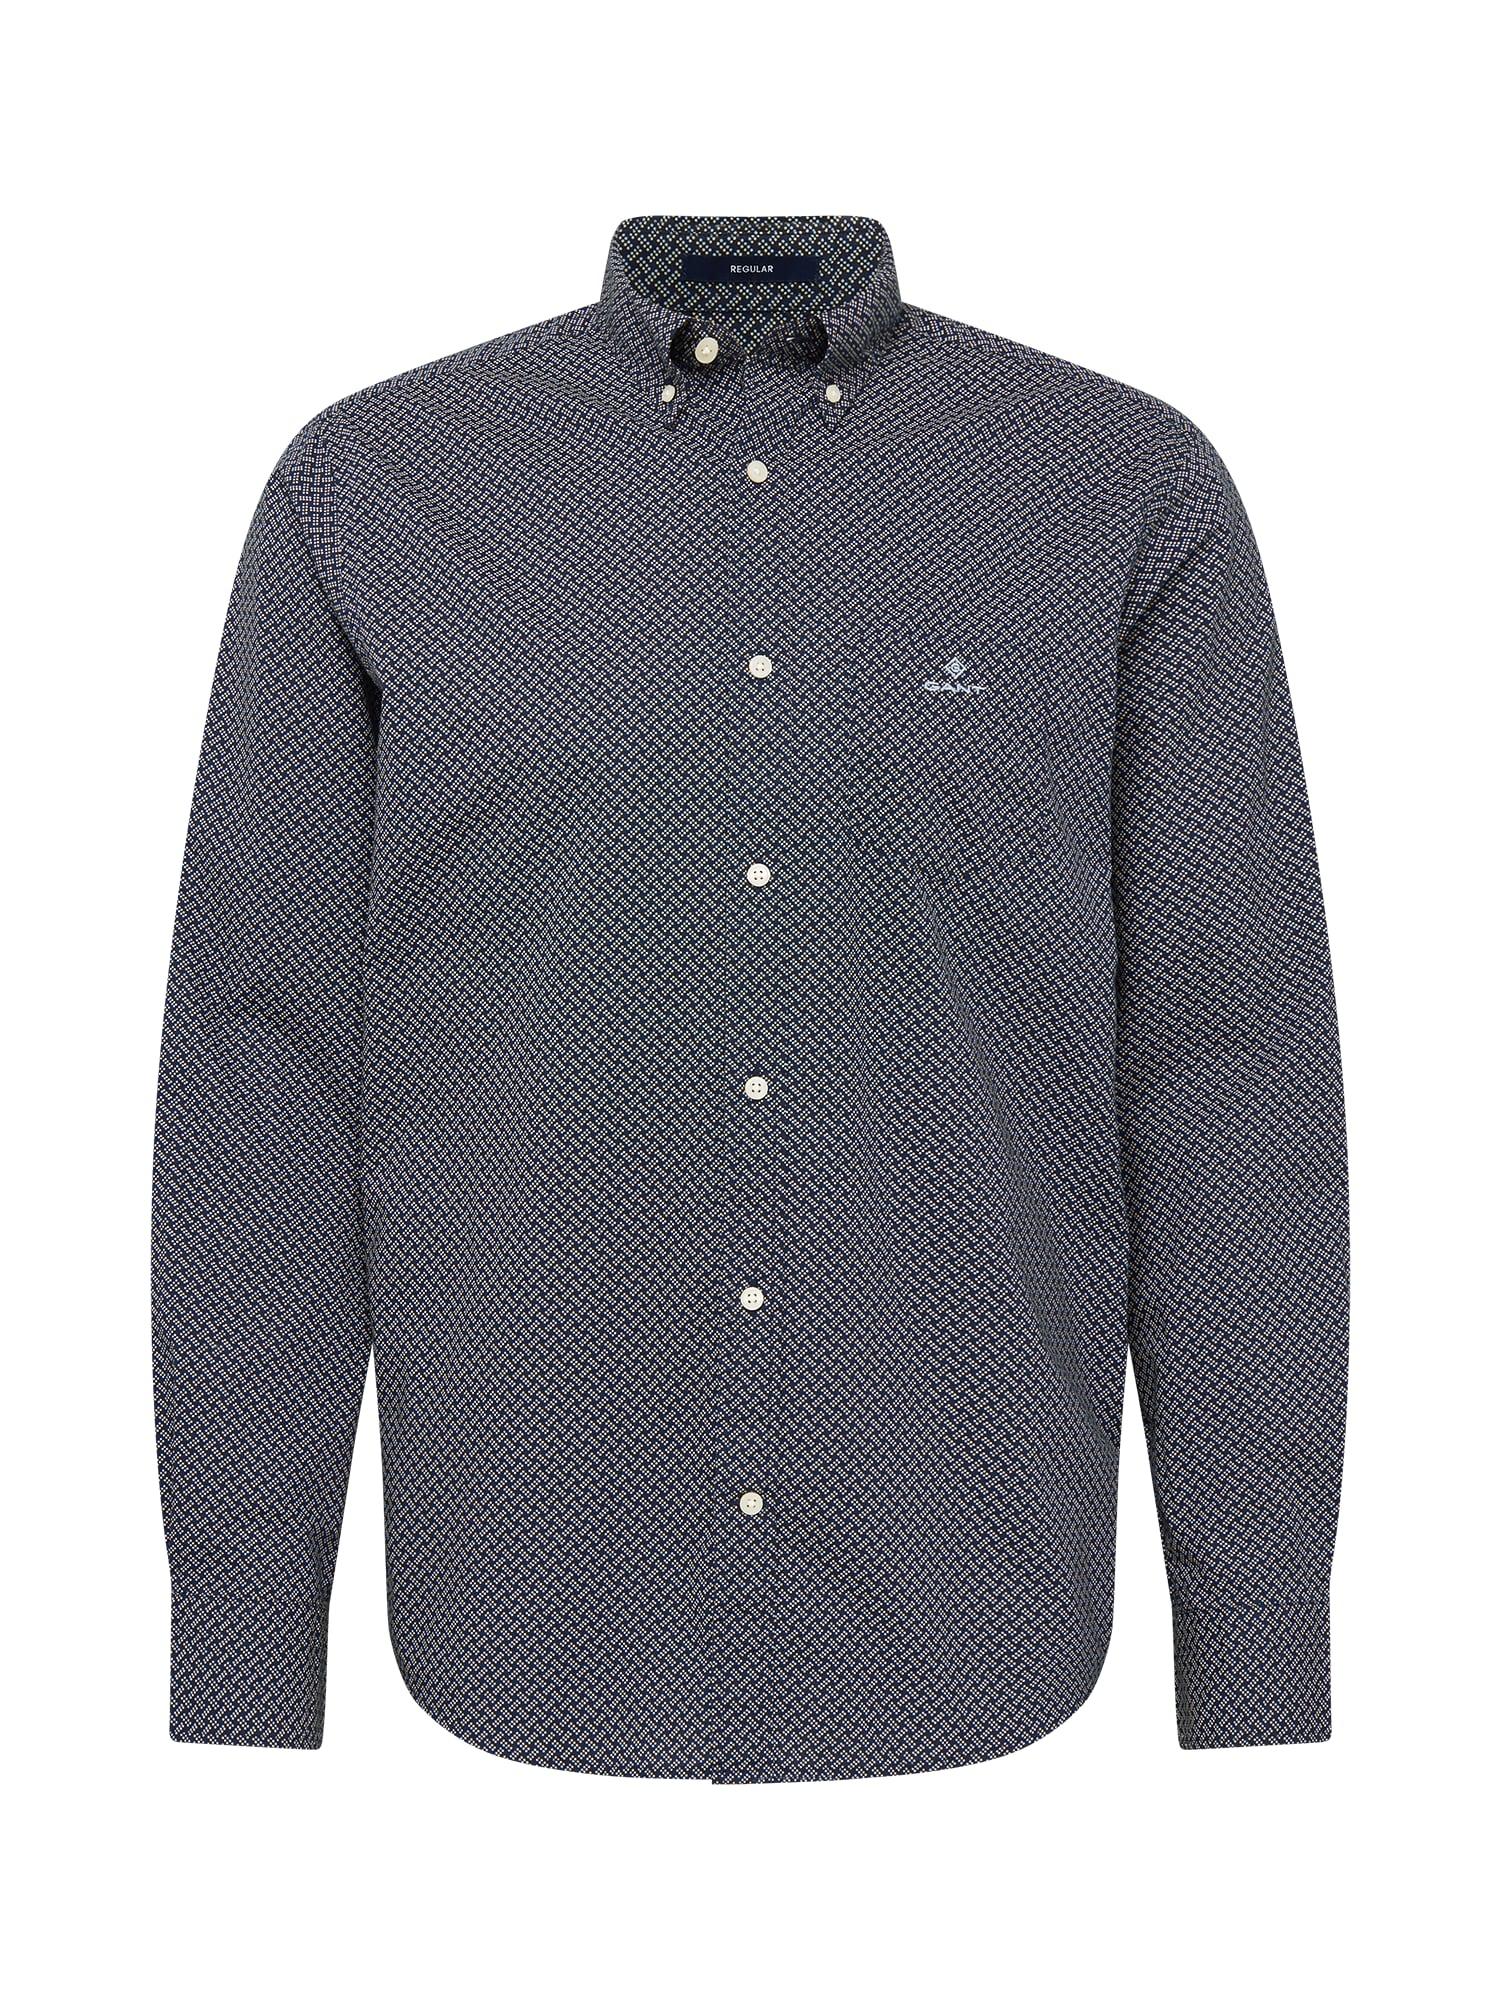 "GANT Marškiniai mėlyna / sodri mėlyna (""karališka"")"